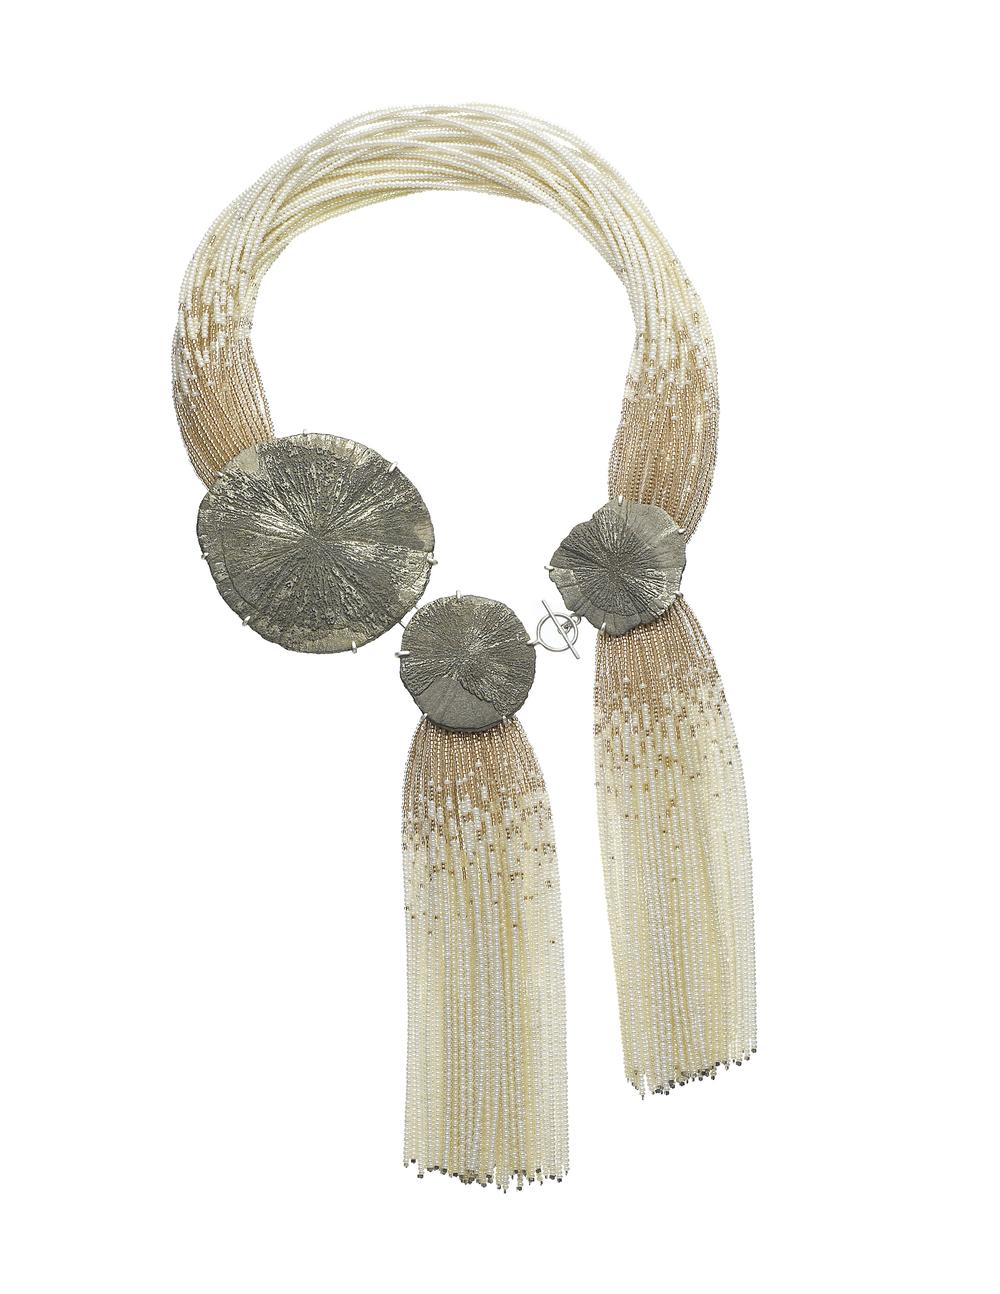 Nimbus necklace by Michelle Pajak-Reynolds